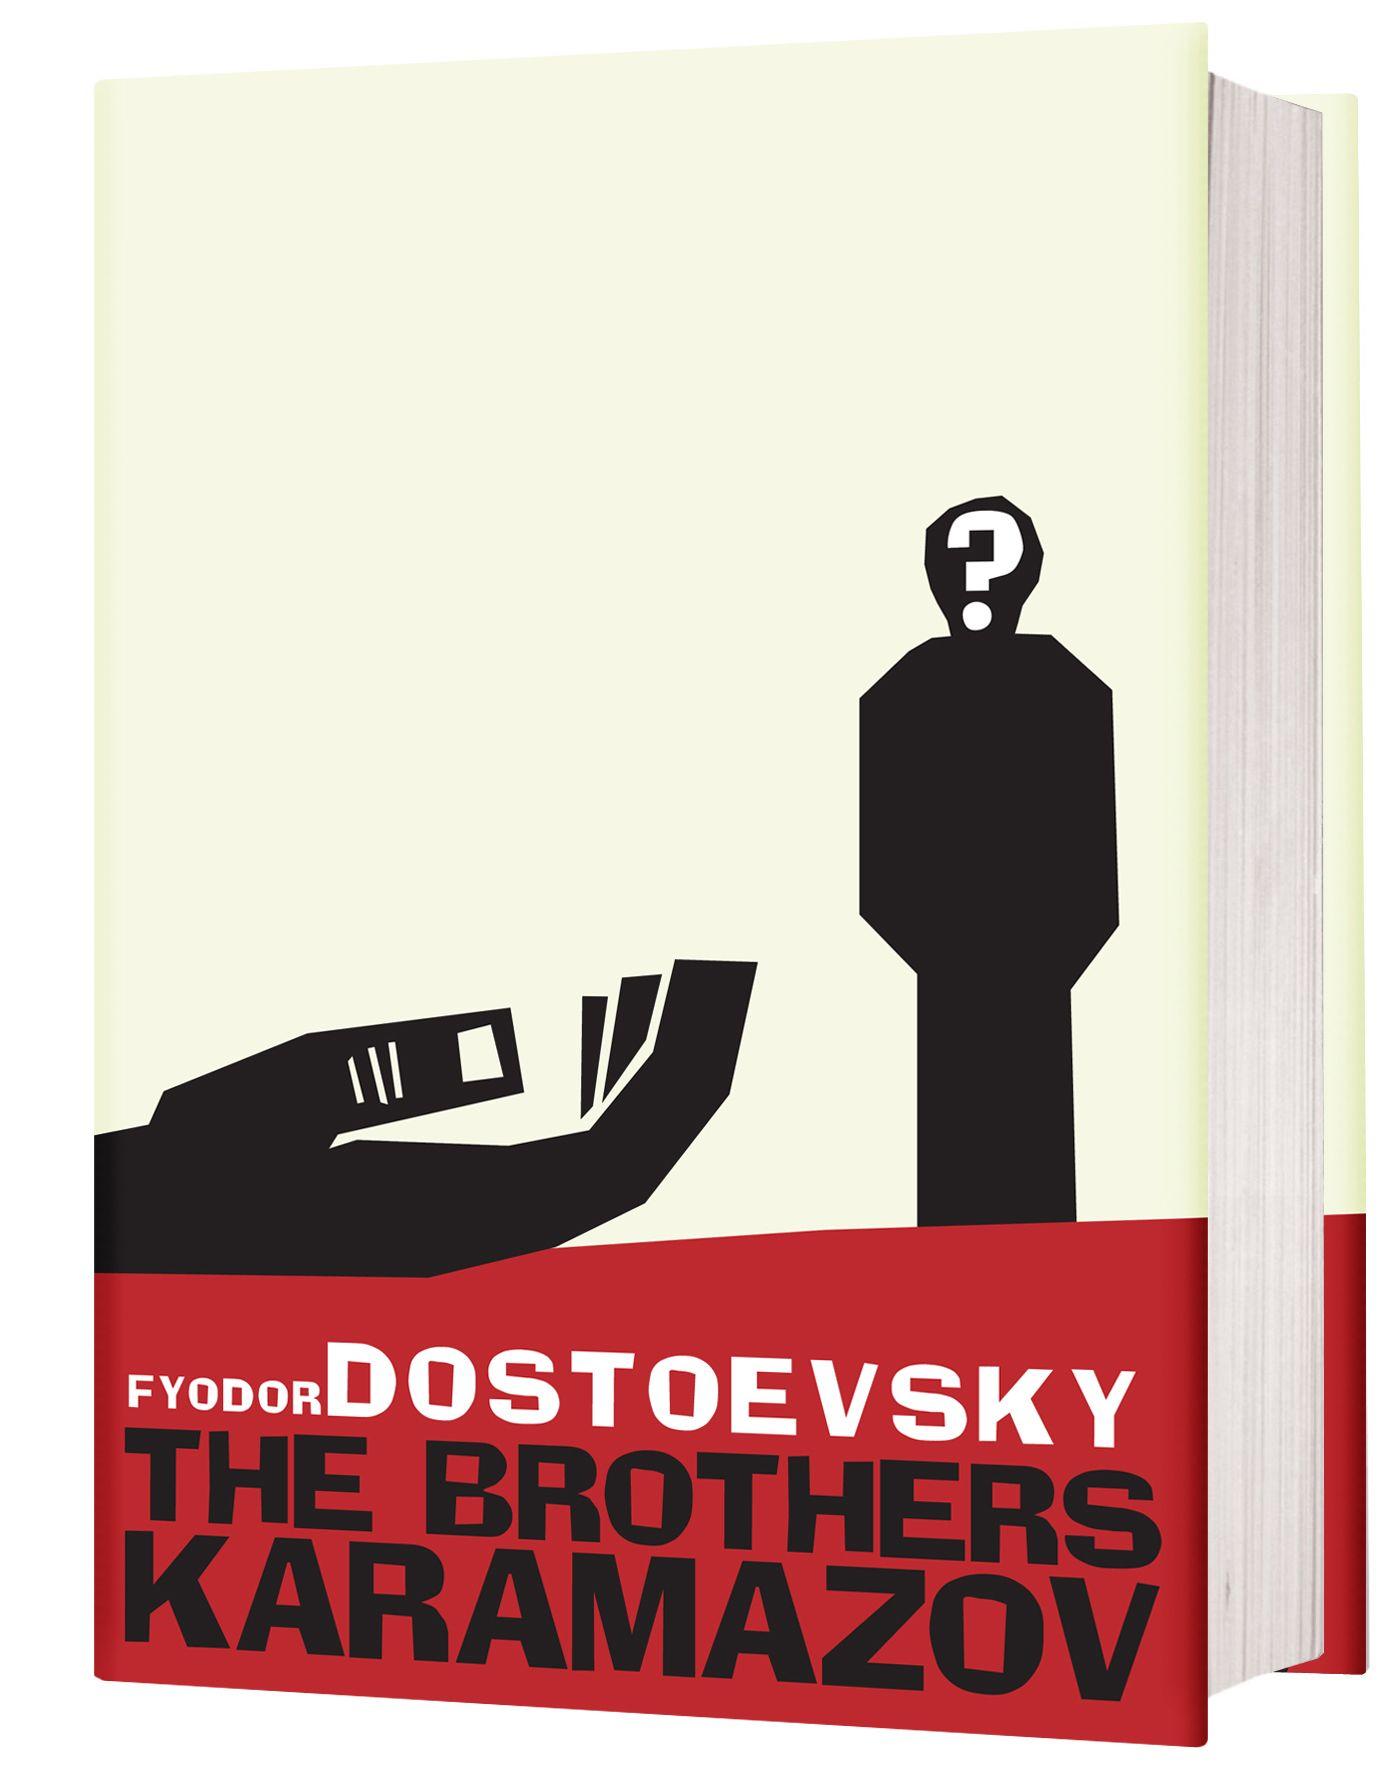 The Brothers Karamazov ~ Fyodor Dostoevsky